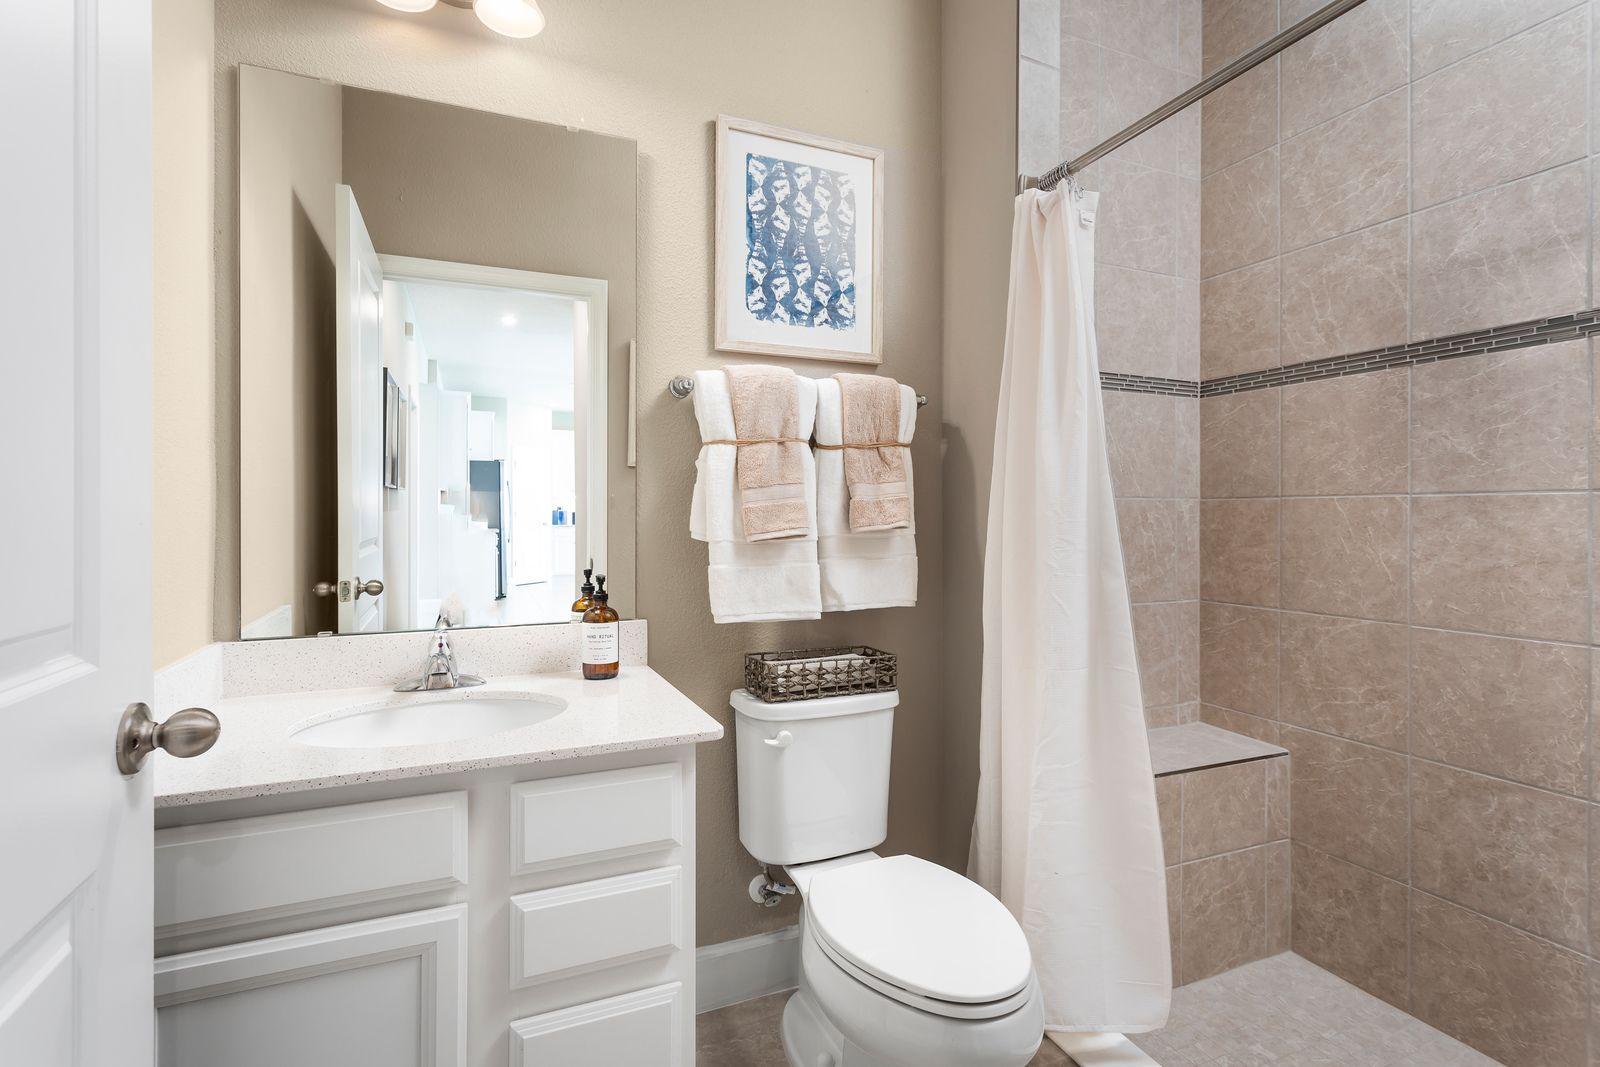 Bathroom featured in the Lynn Haven By Ryan Homes in Orlando, FL